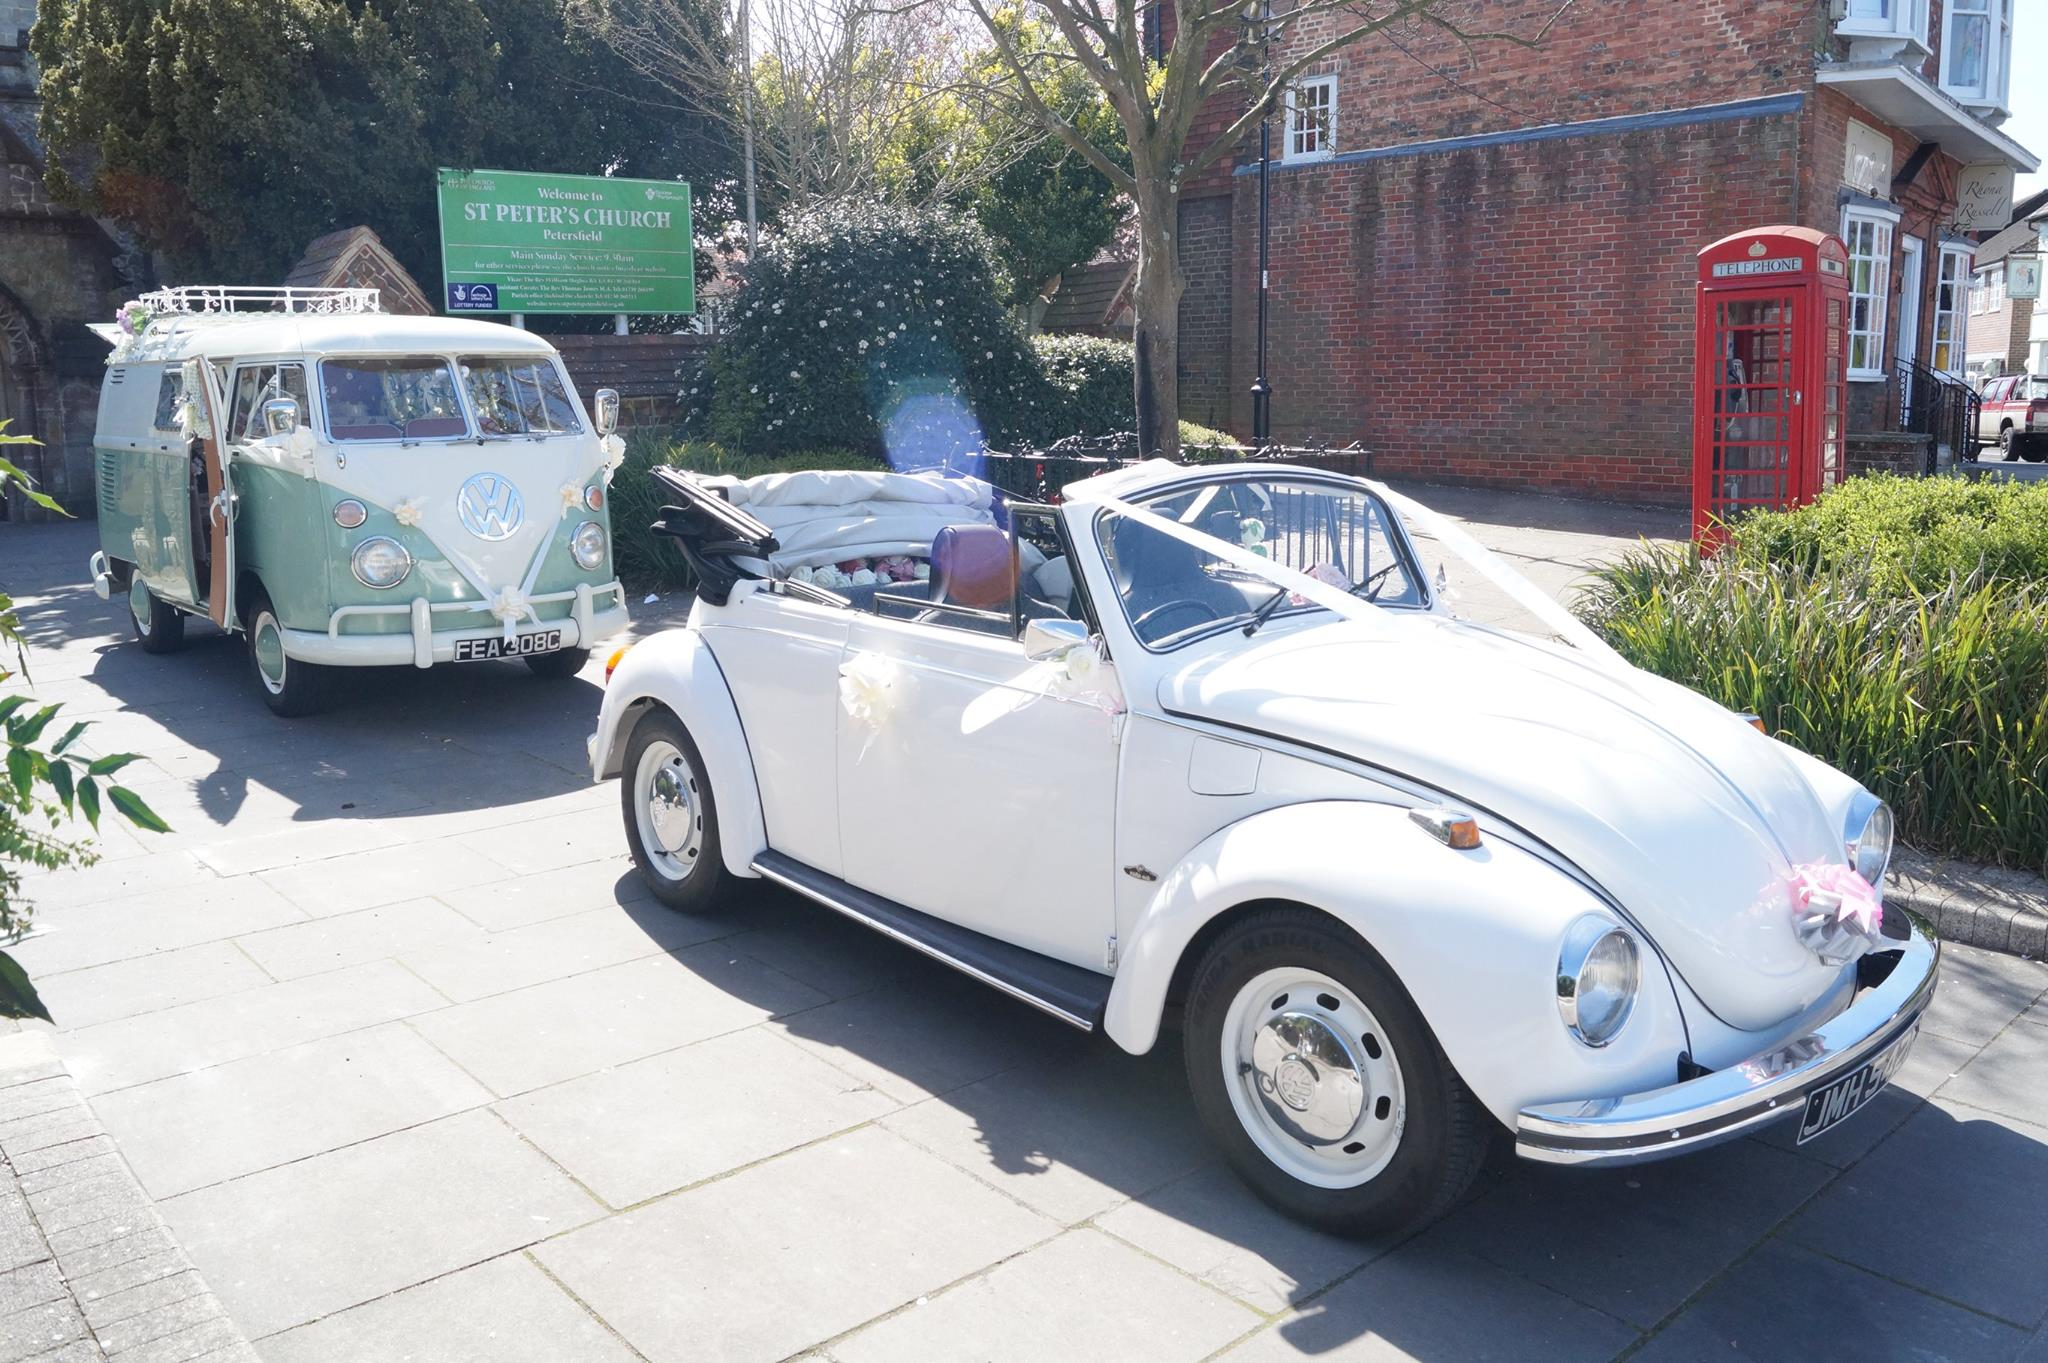 White vw beetle weddings white vw beetle hampshire wedding junglespirit Choice Image